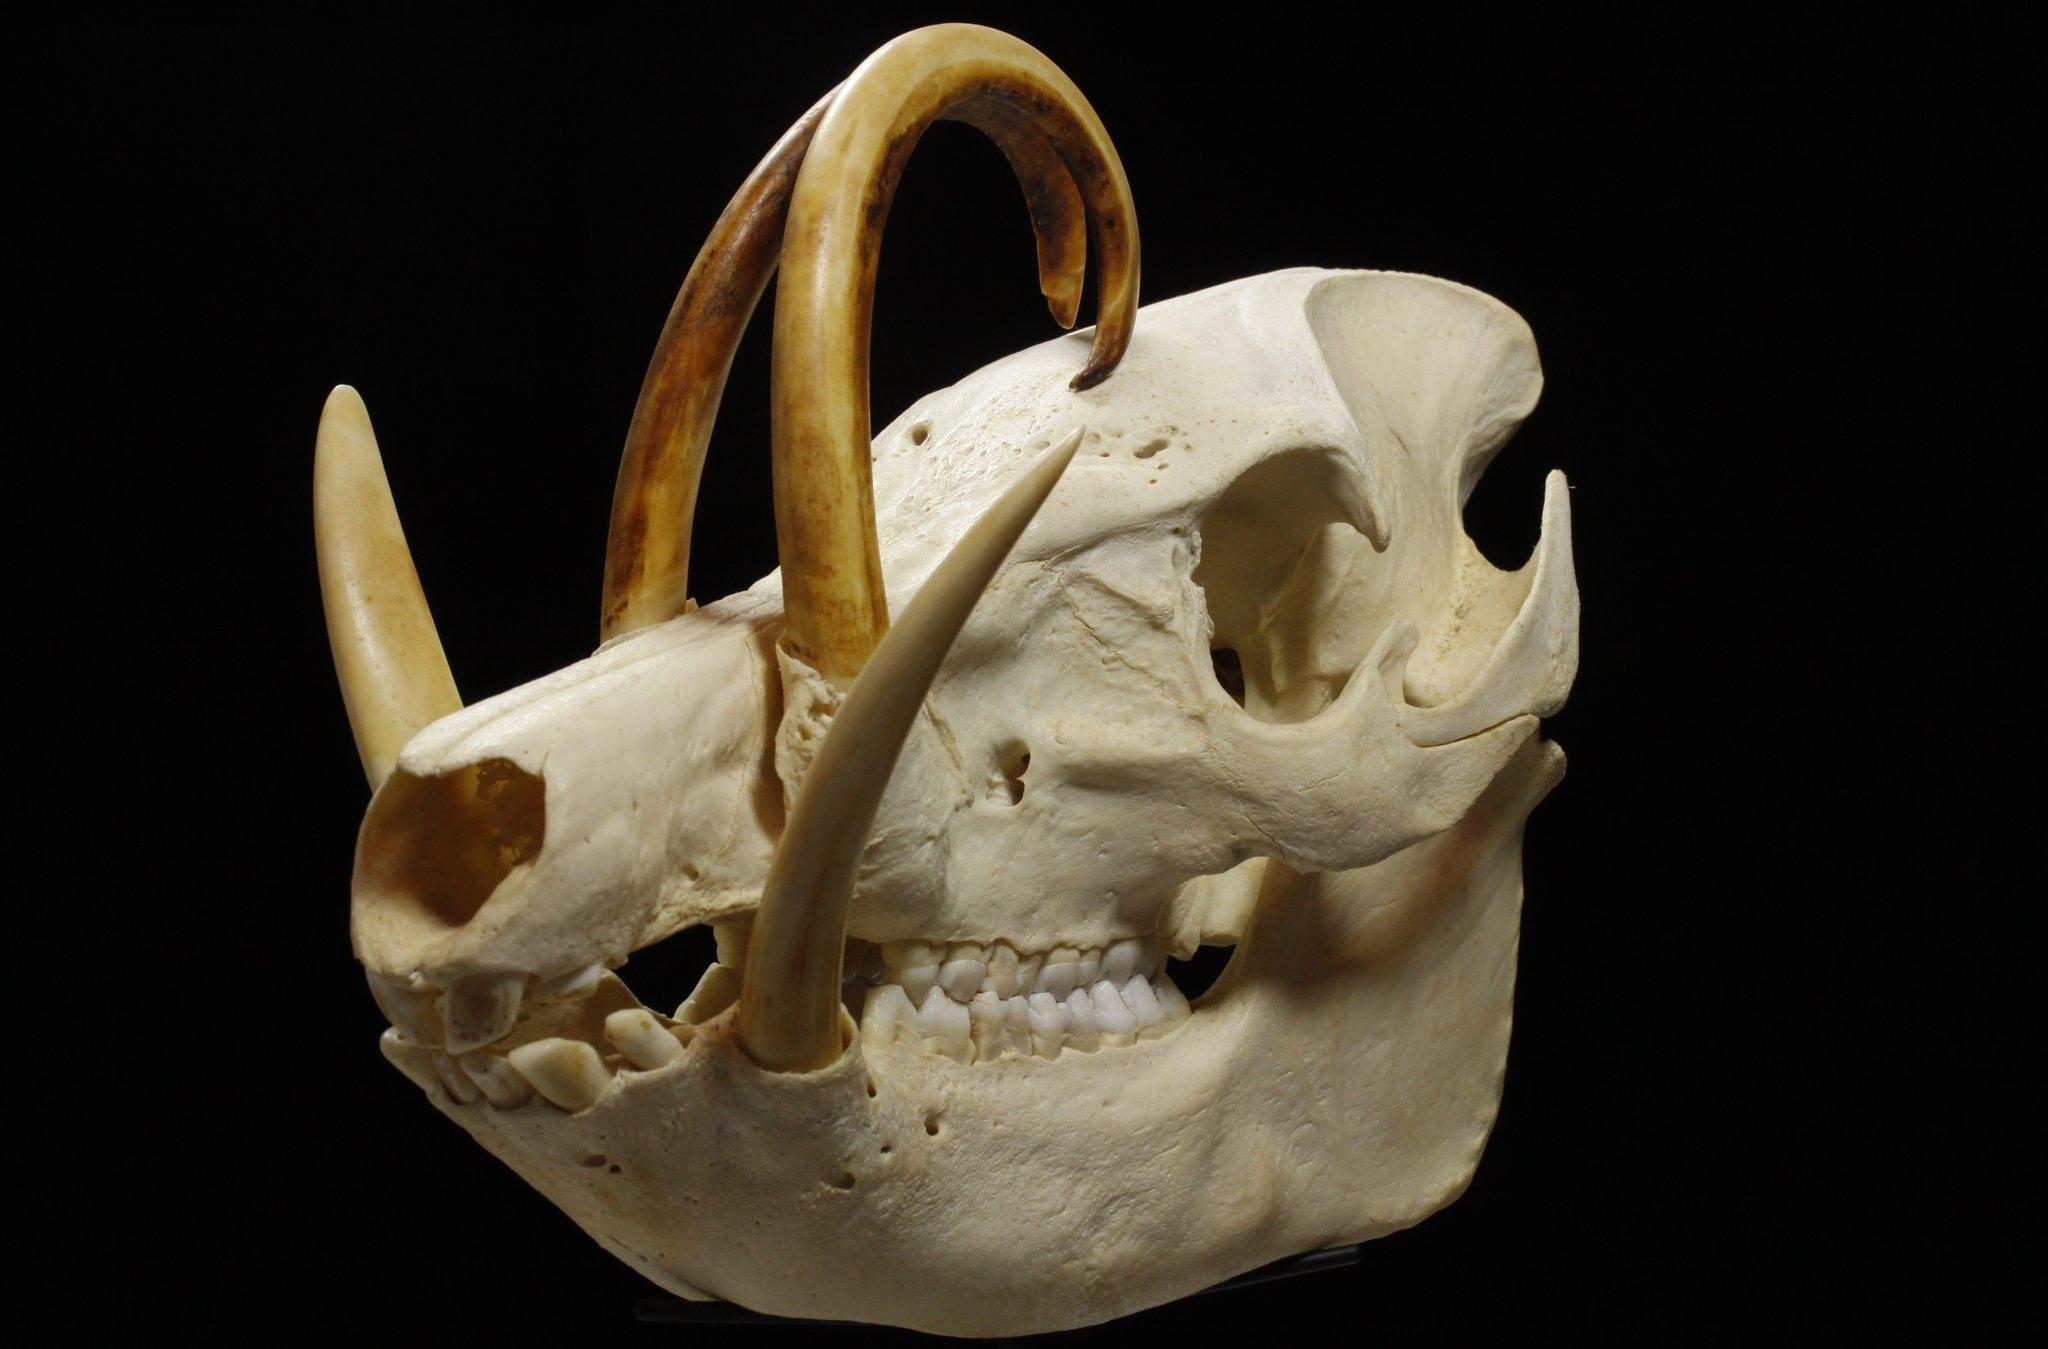 Skulls Engineered to Take Hard Knocks - The New York Times